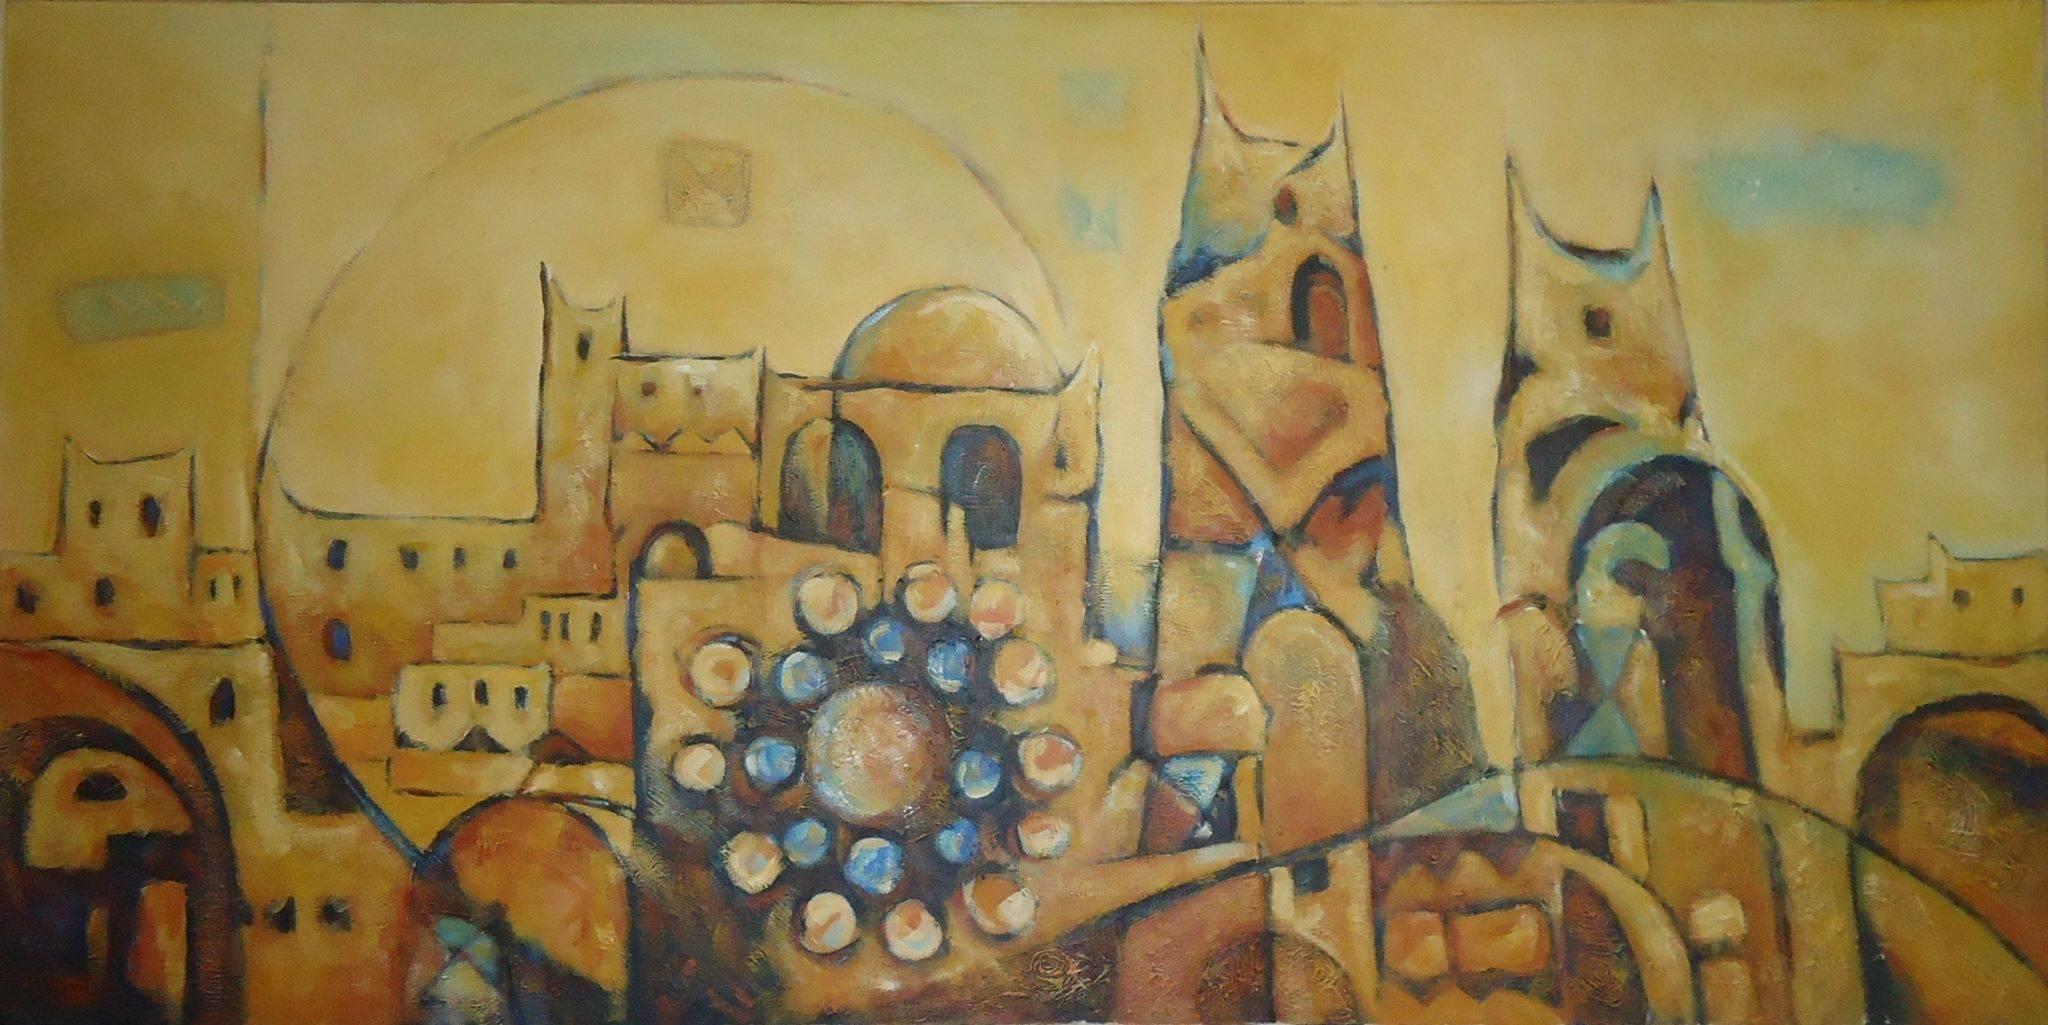 Ghardaia * city of mirage n: 02